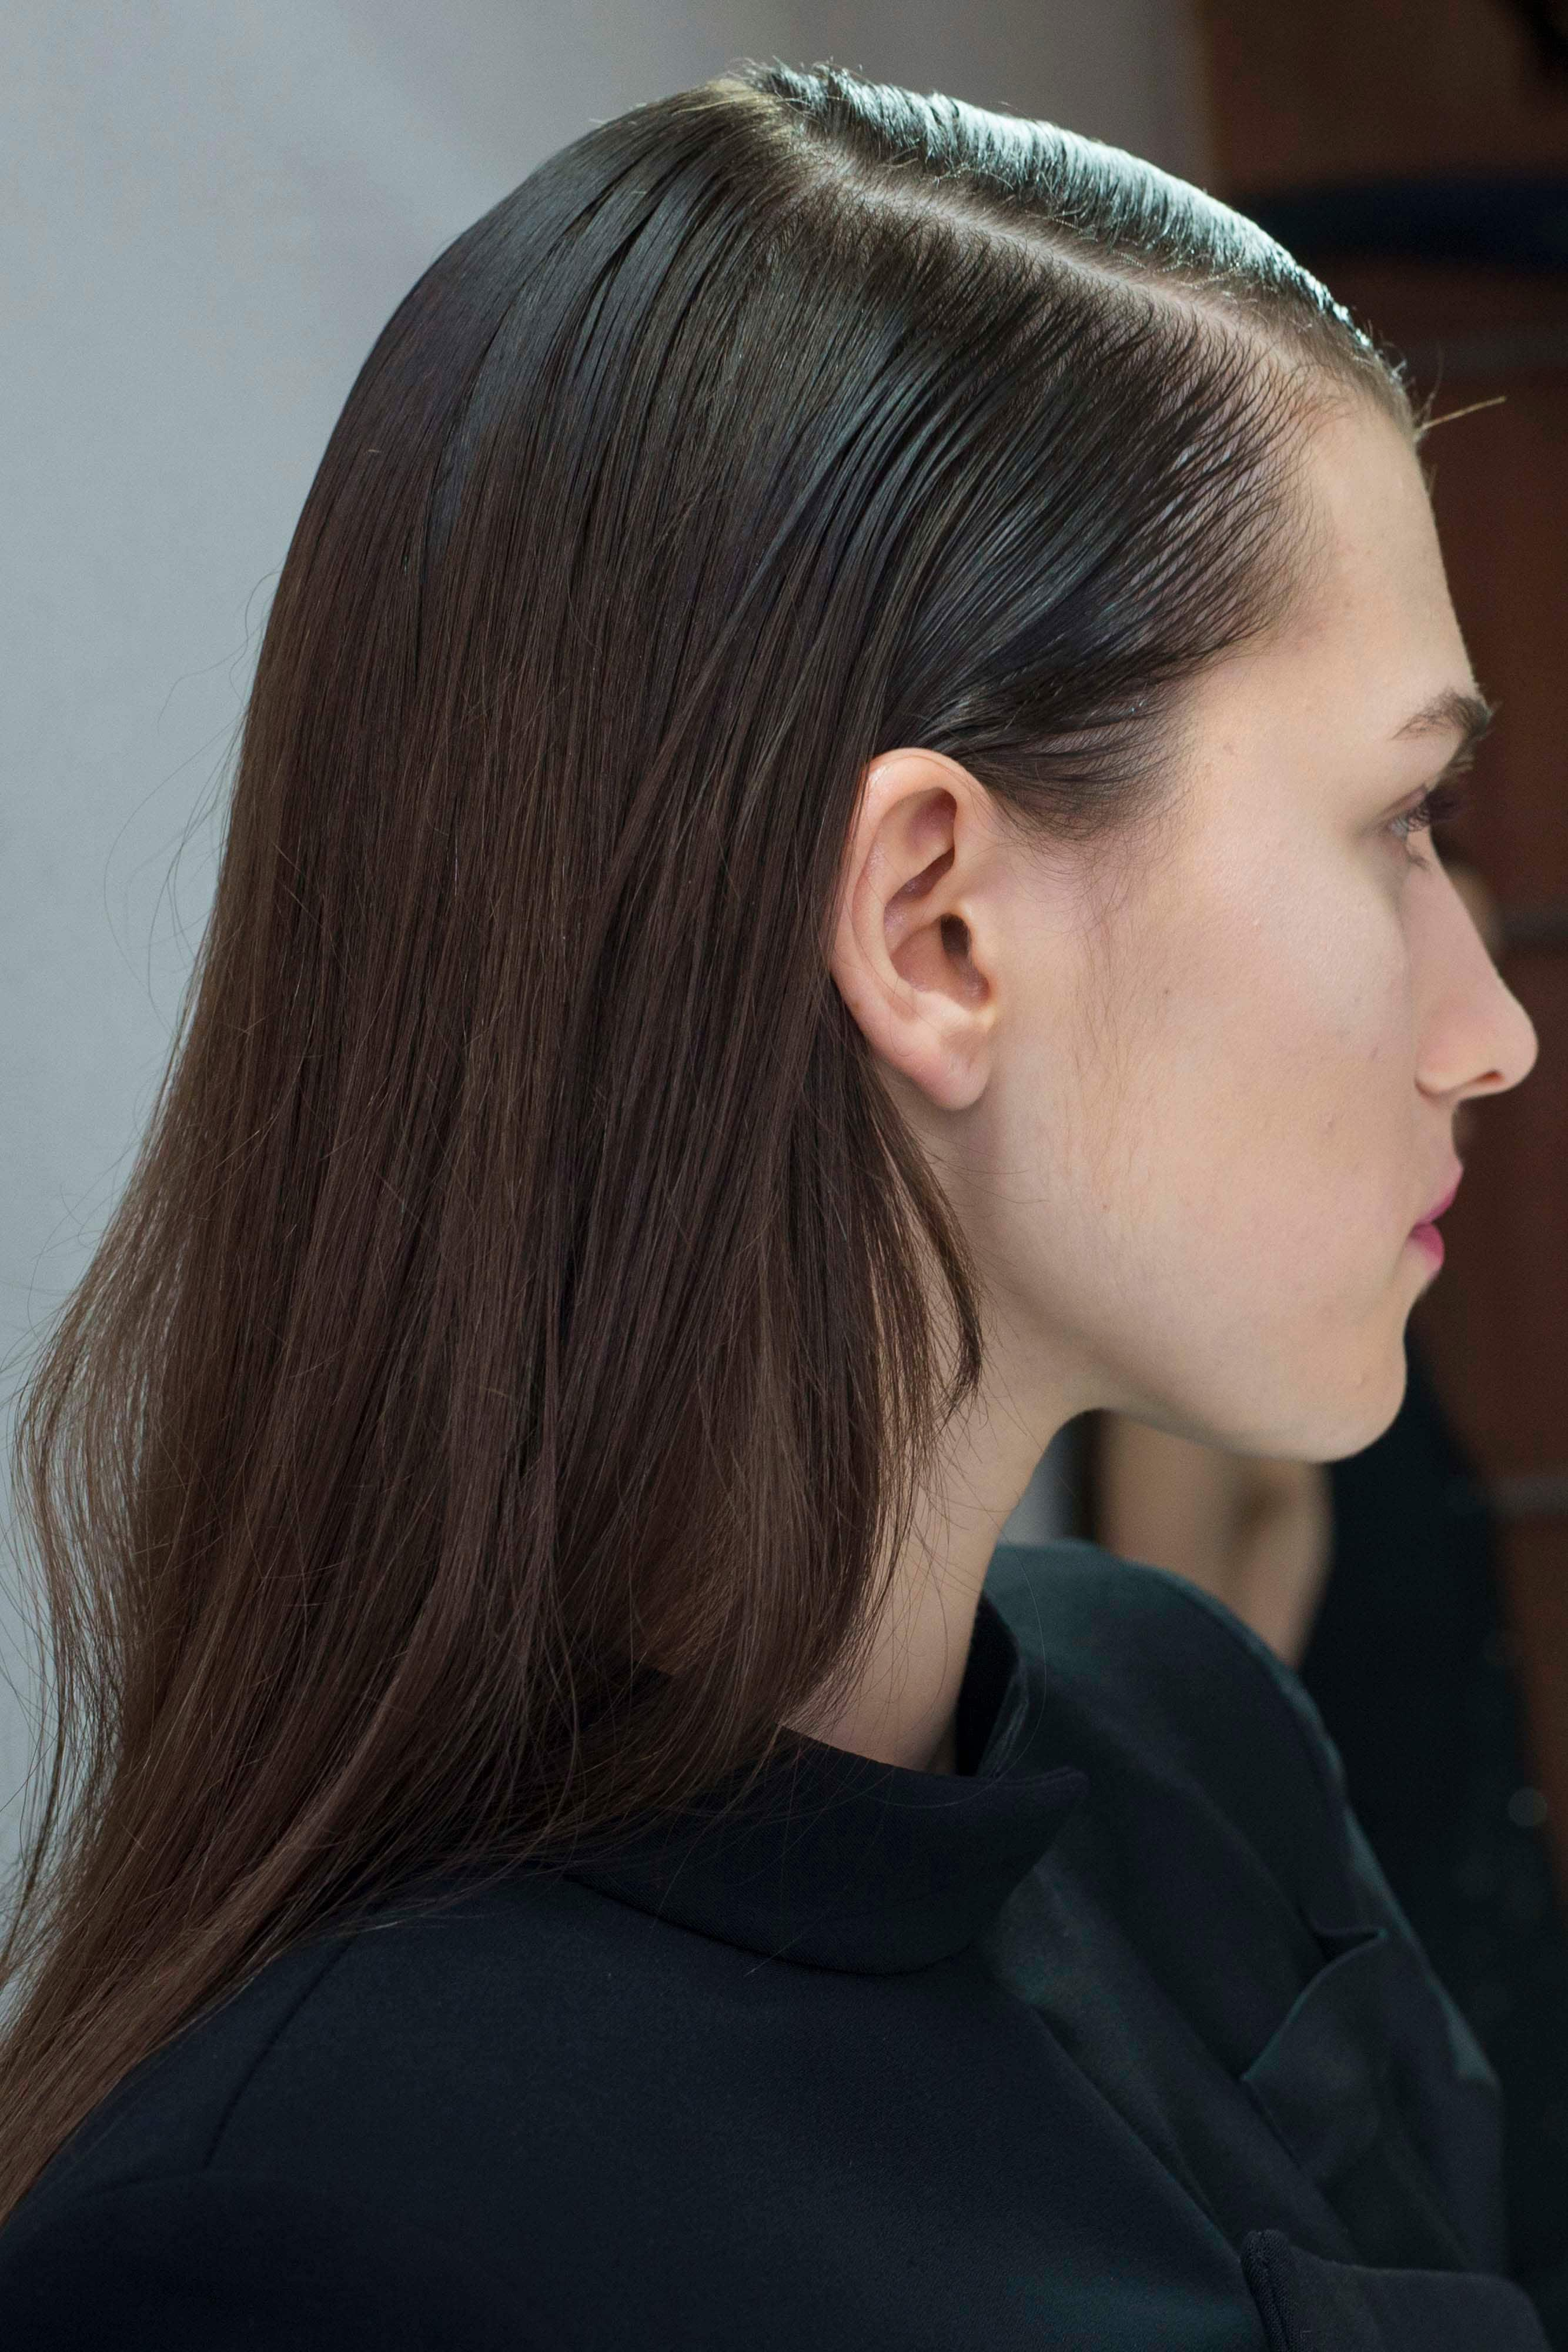 argan oil benefits shiny hair